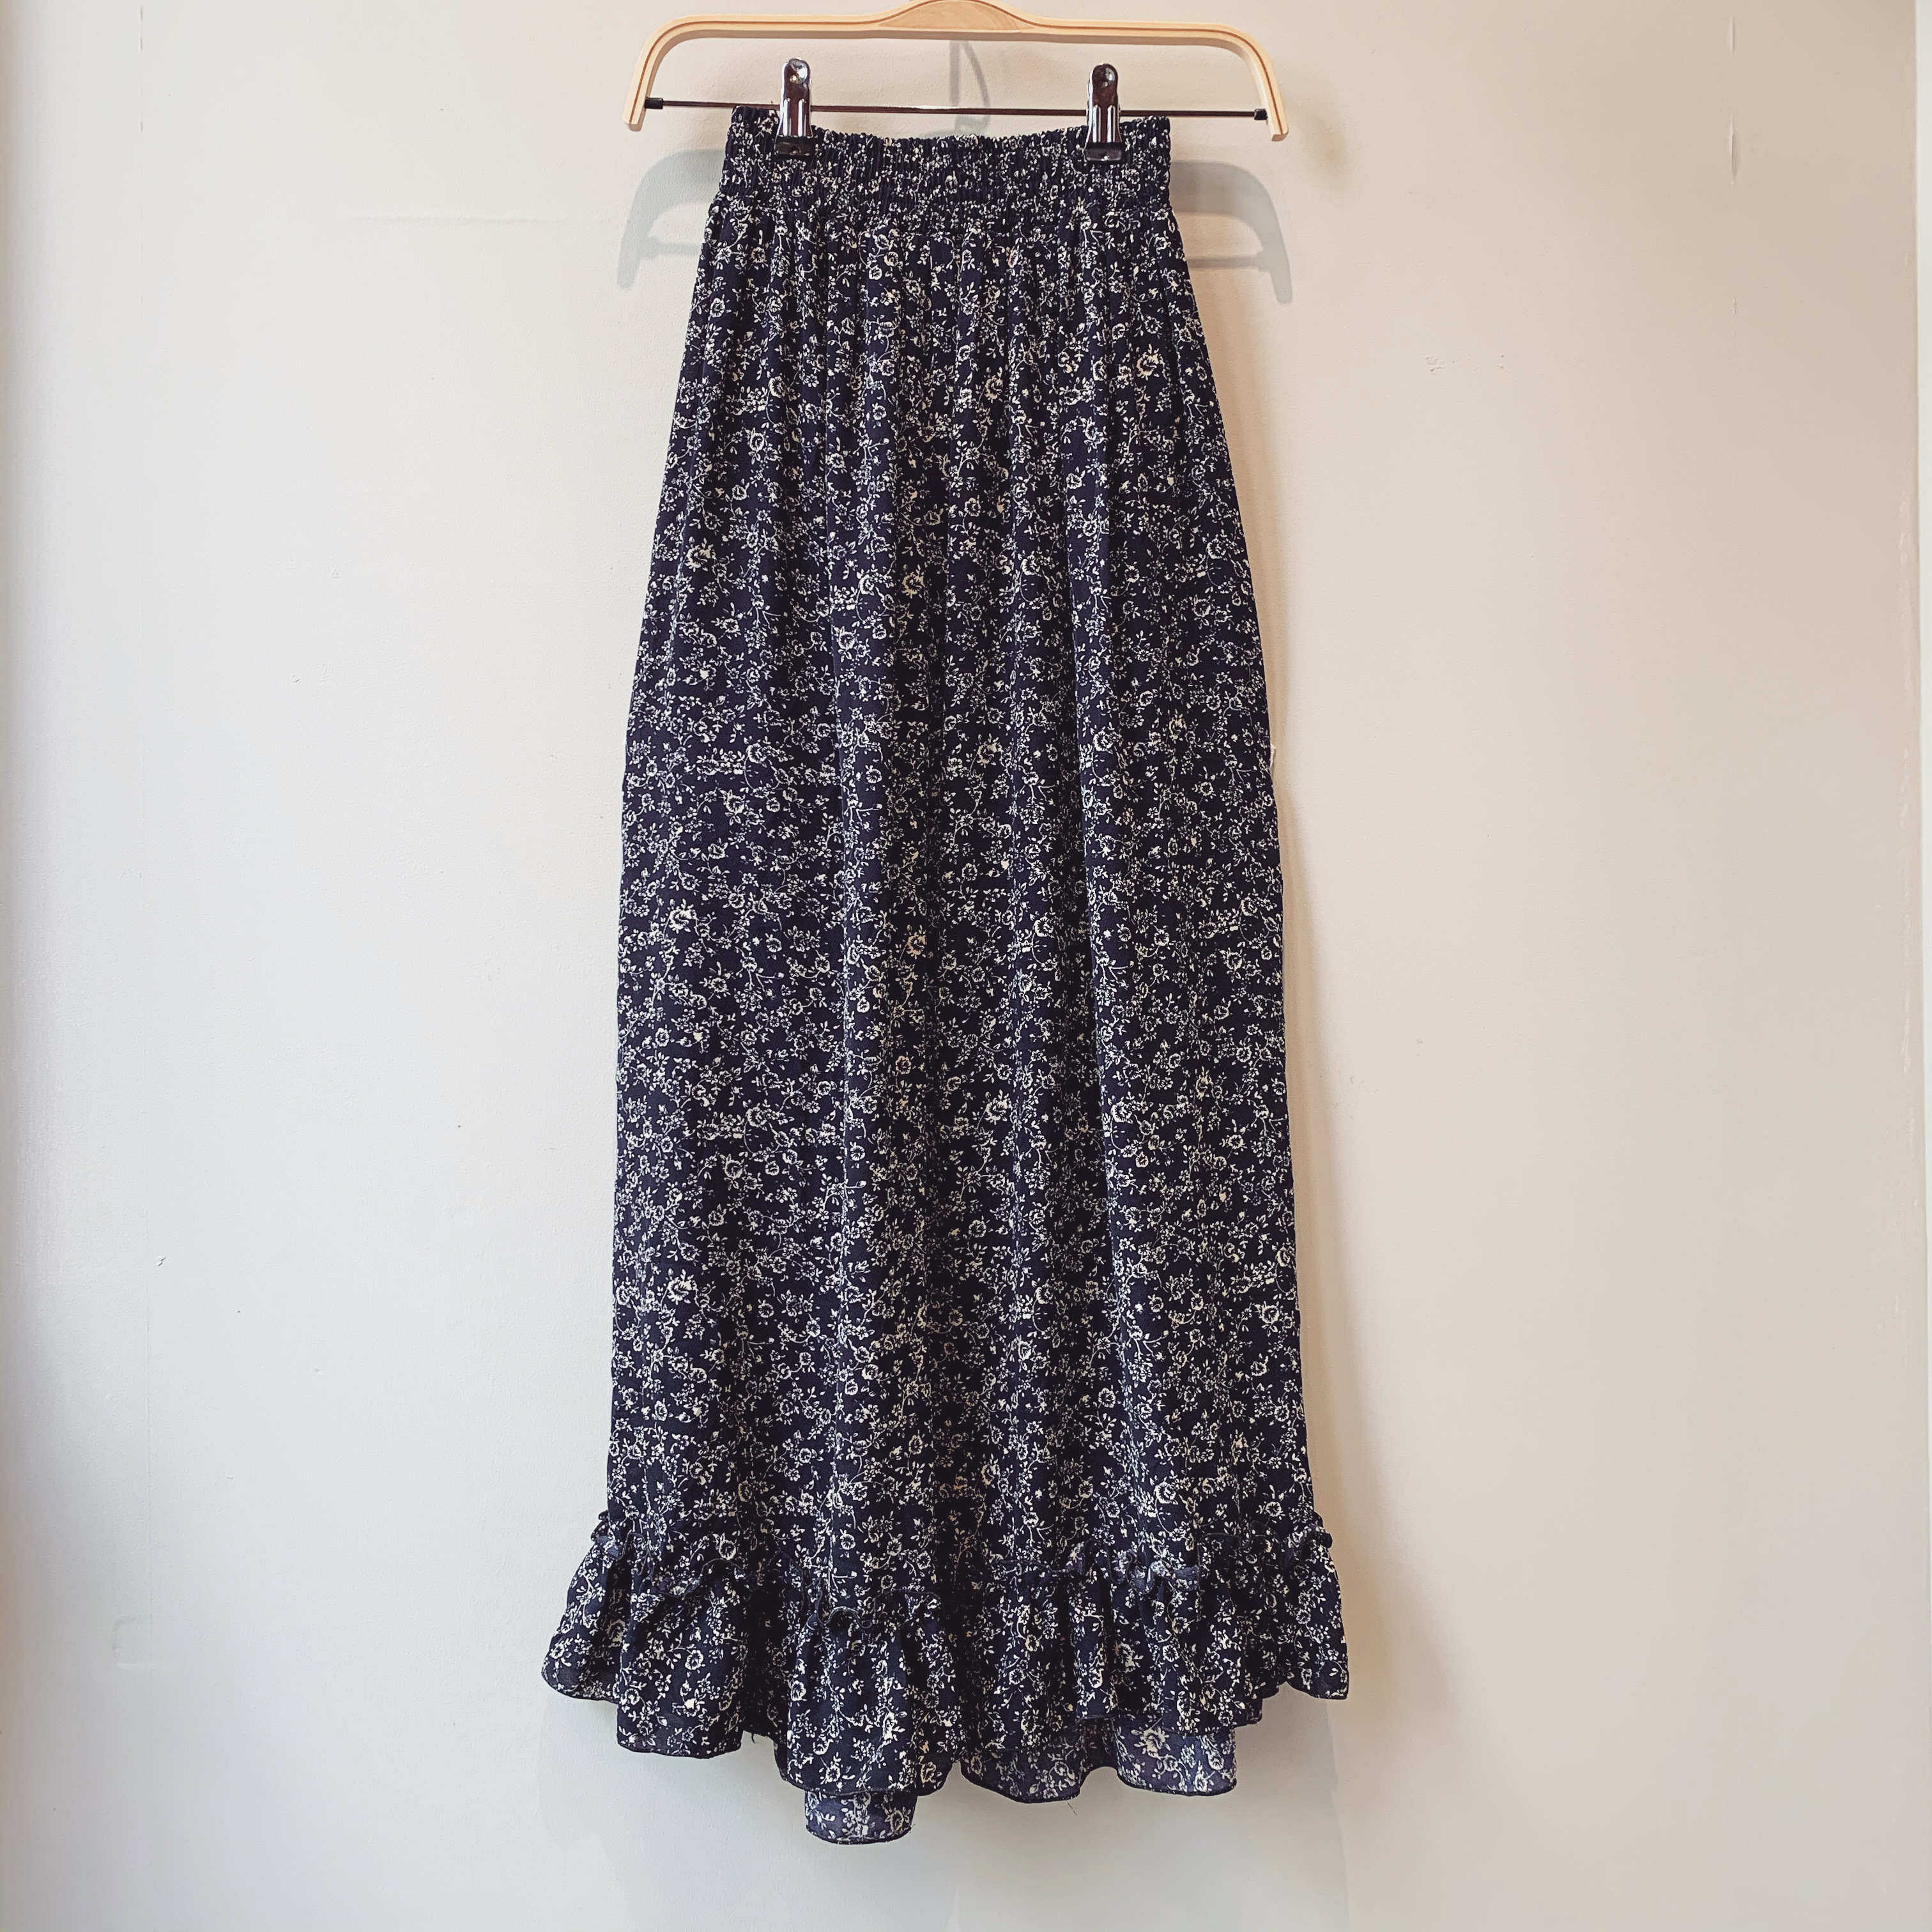 vintage mermaid design skirt